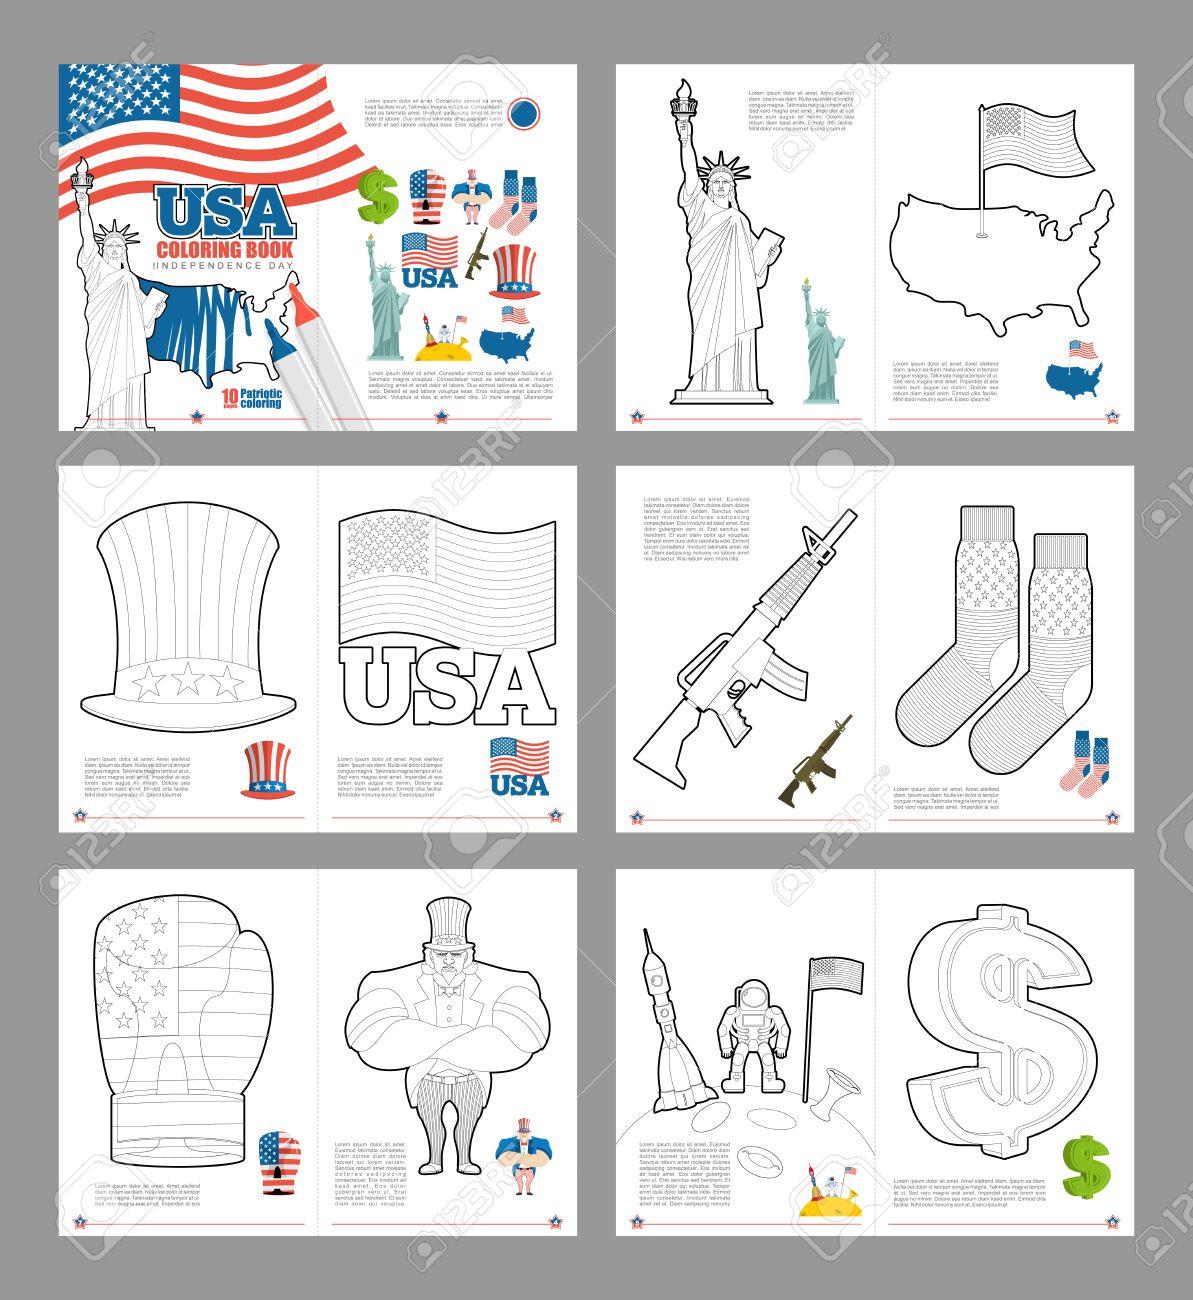 USA Malbuch. Pattic Buch Zum Färben. Nationale Symbole Amerika ...